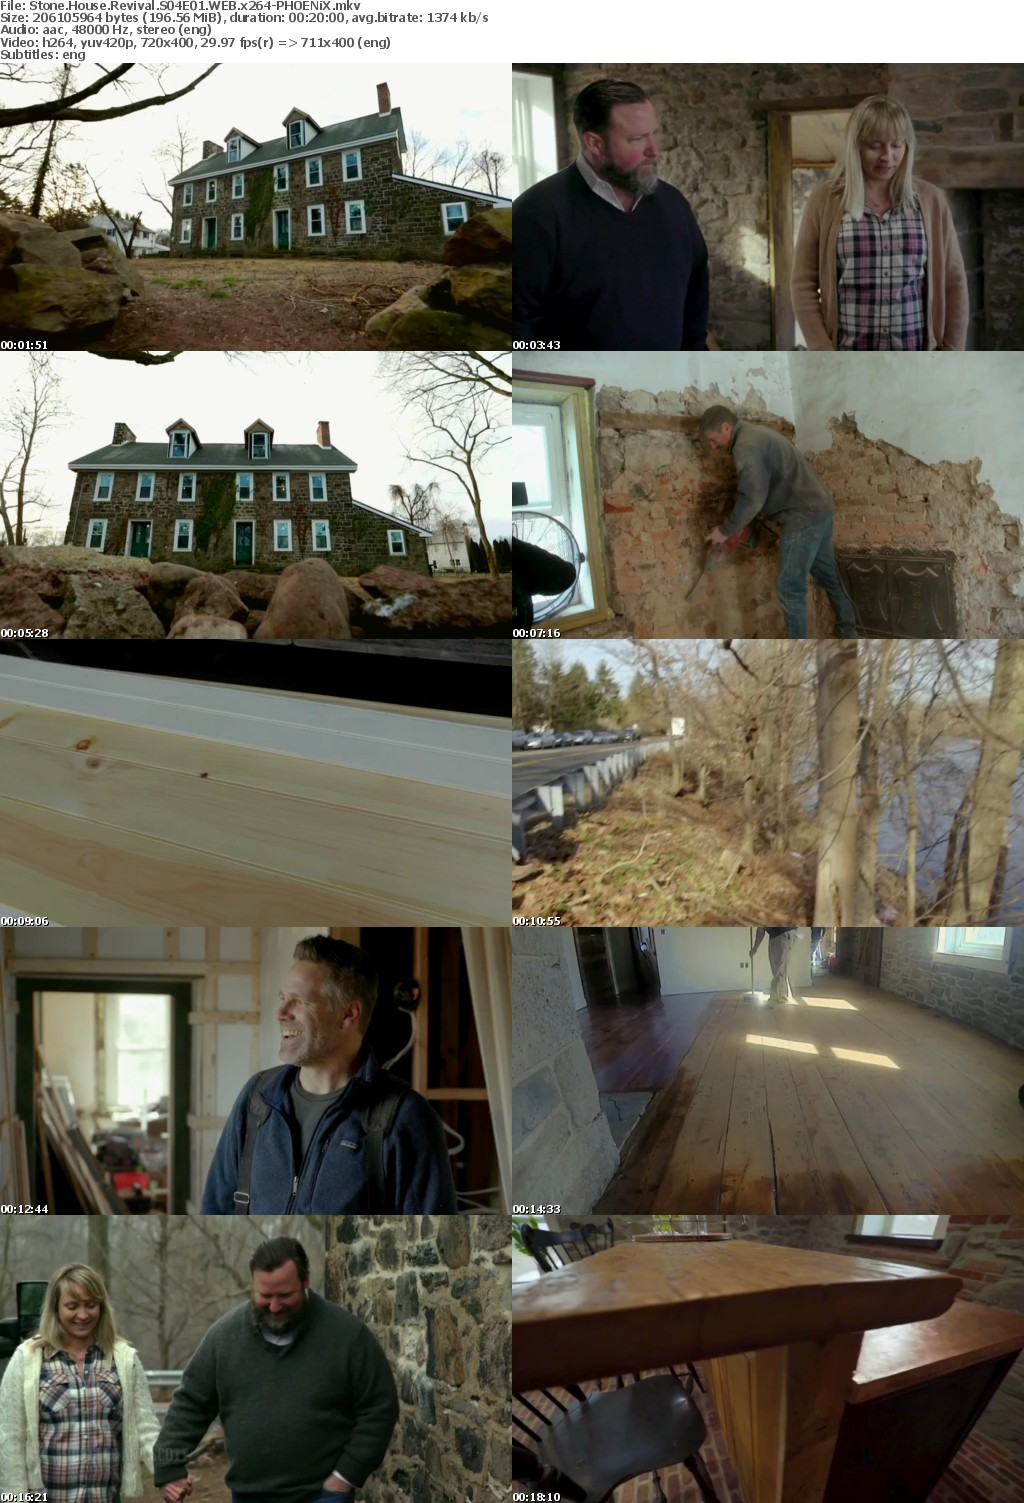 Stone House Revival S04E01 WEB x264-PHOENiX